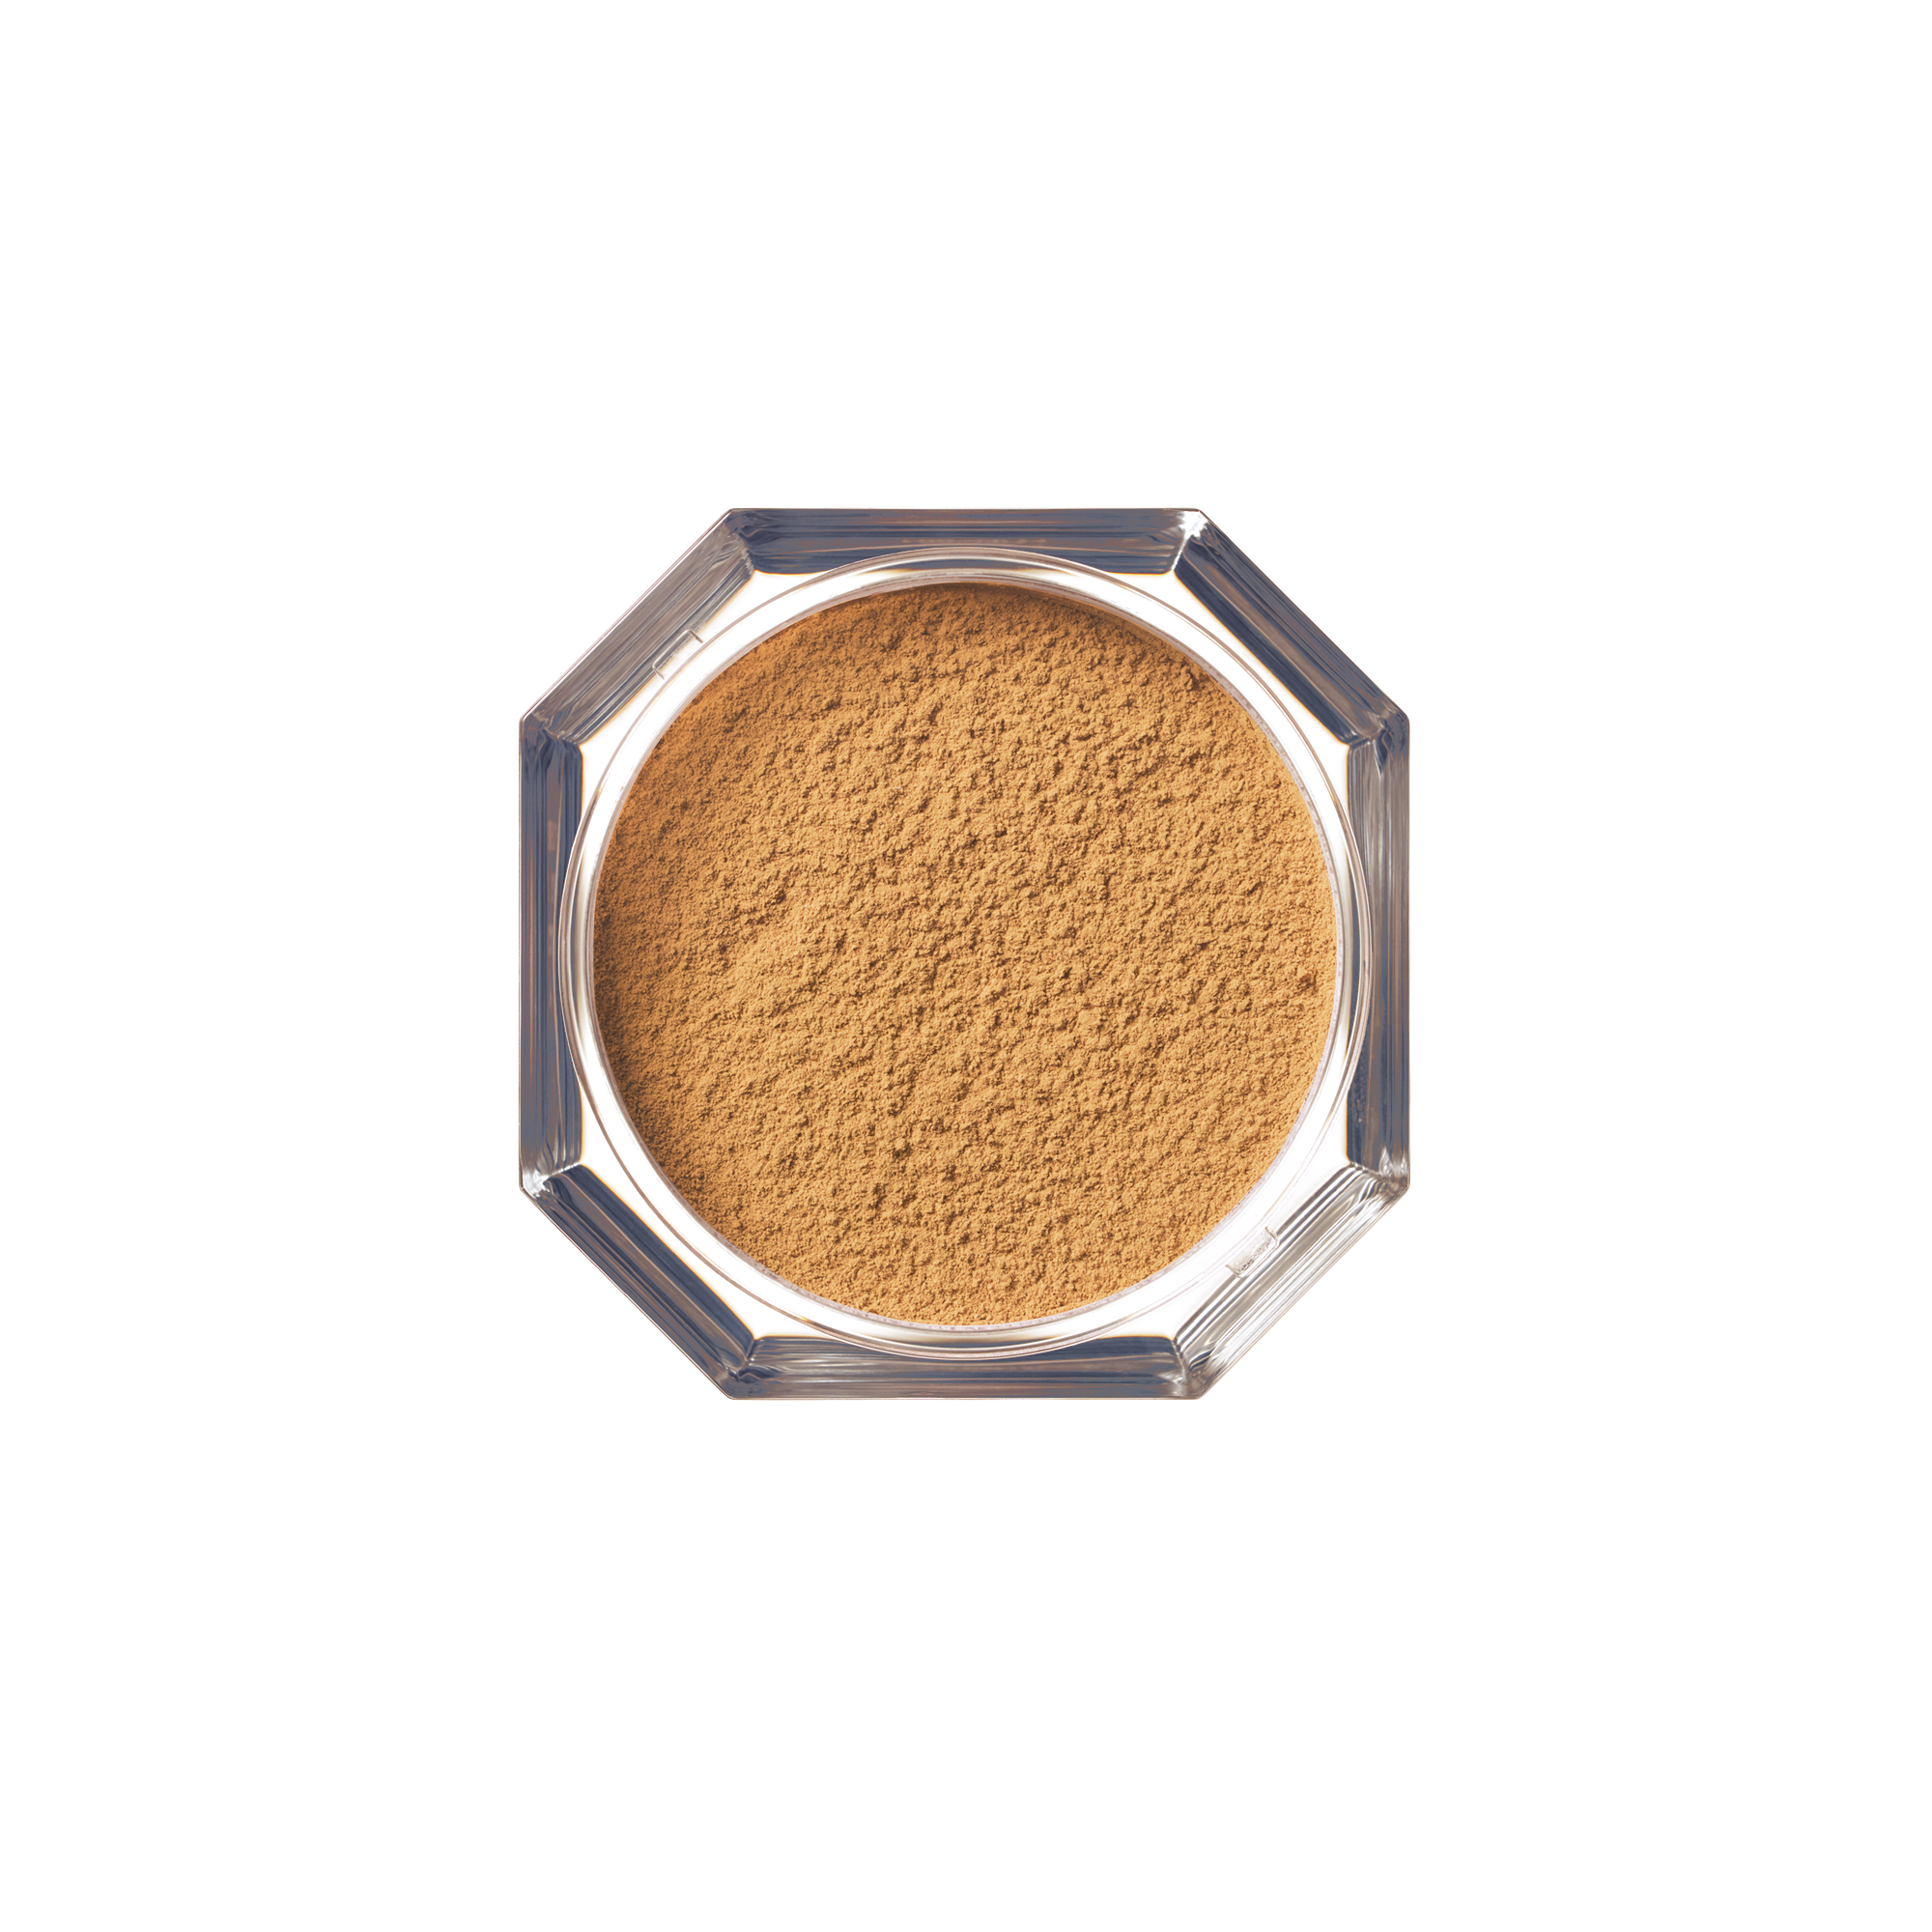 FB Pro Filt'r Instant Retouch Setting Powder - Hazlenut - AED 158